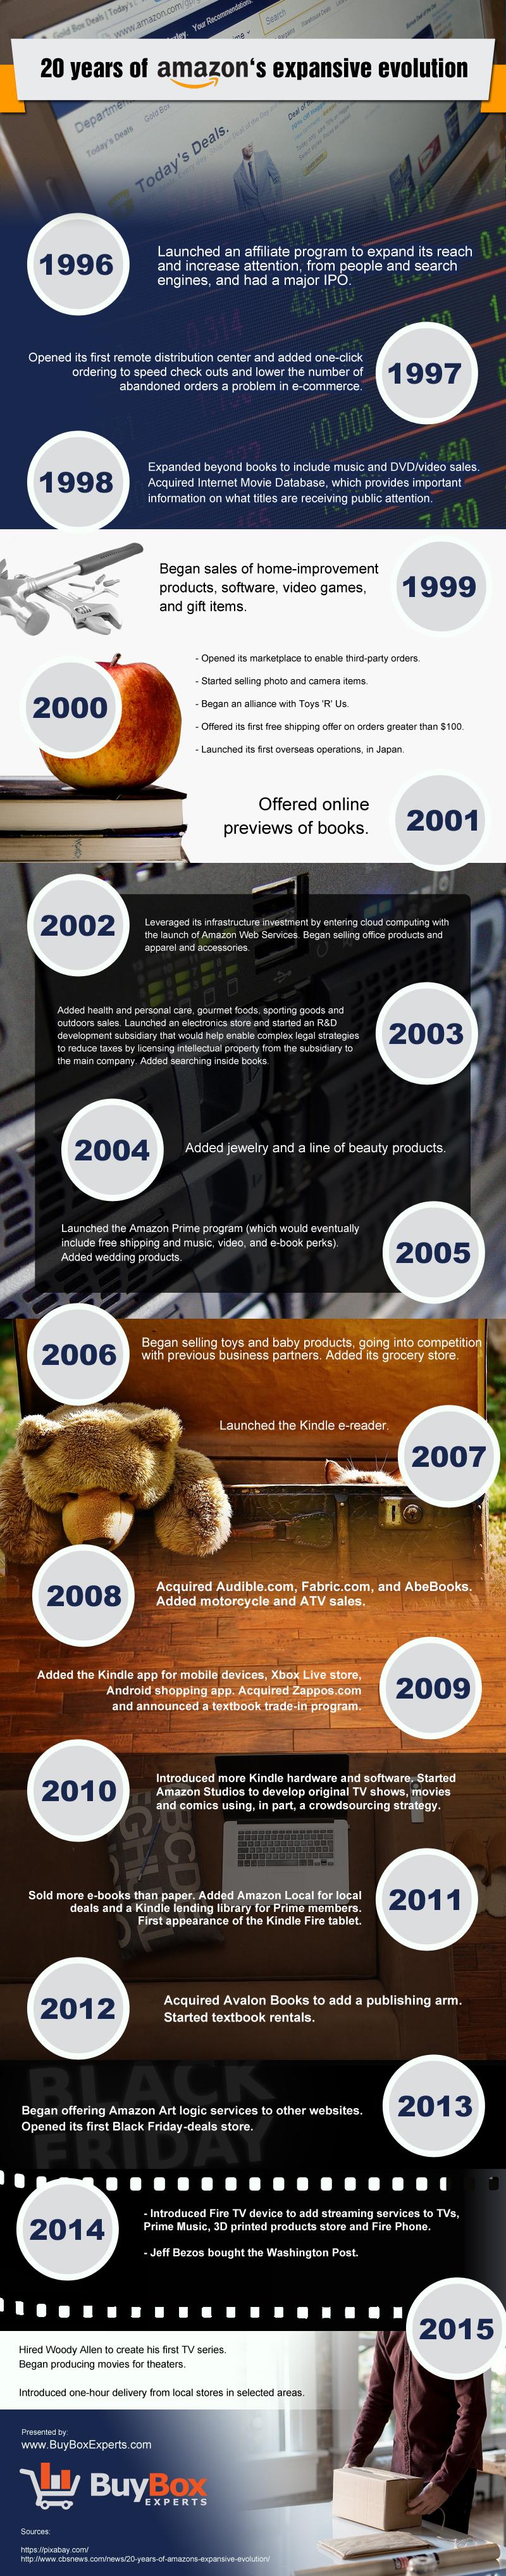 The Evolution of Amazon